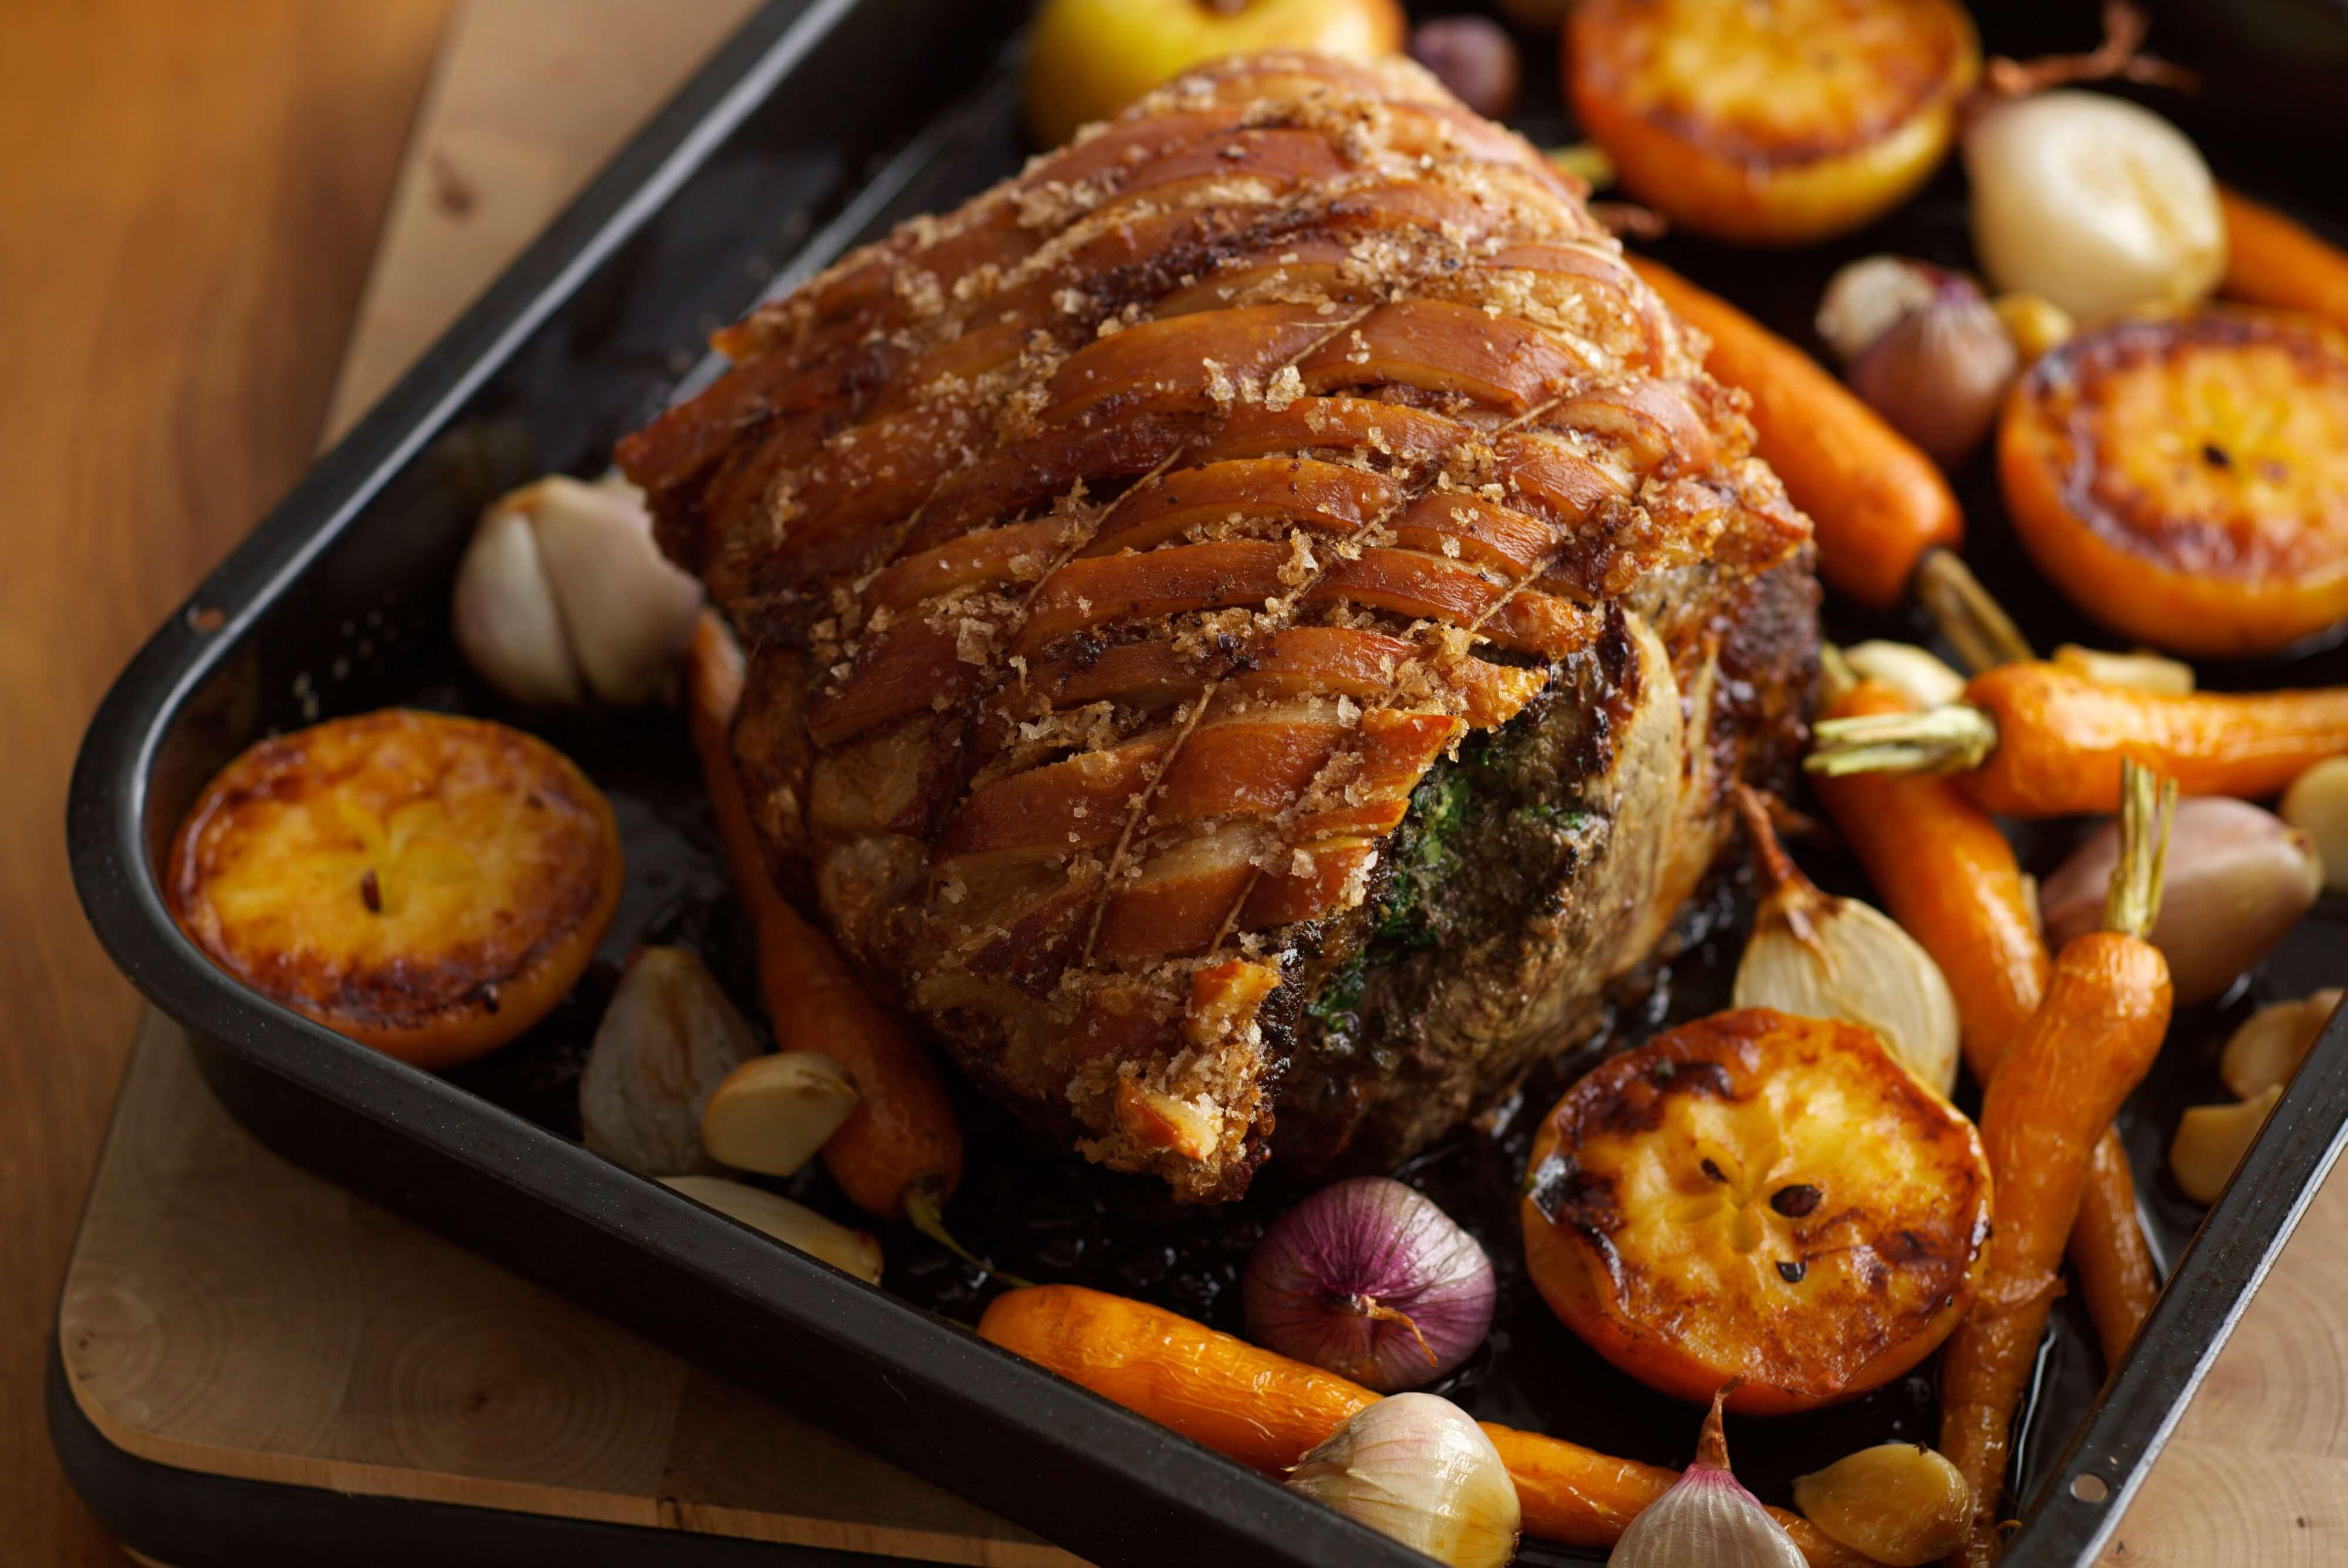 Packington Free Range Whole Shoulder of Pork